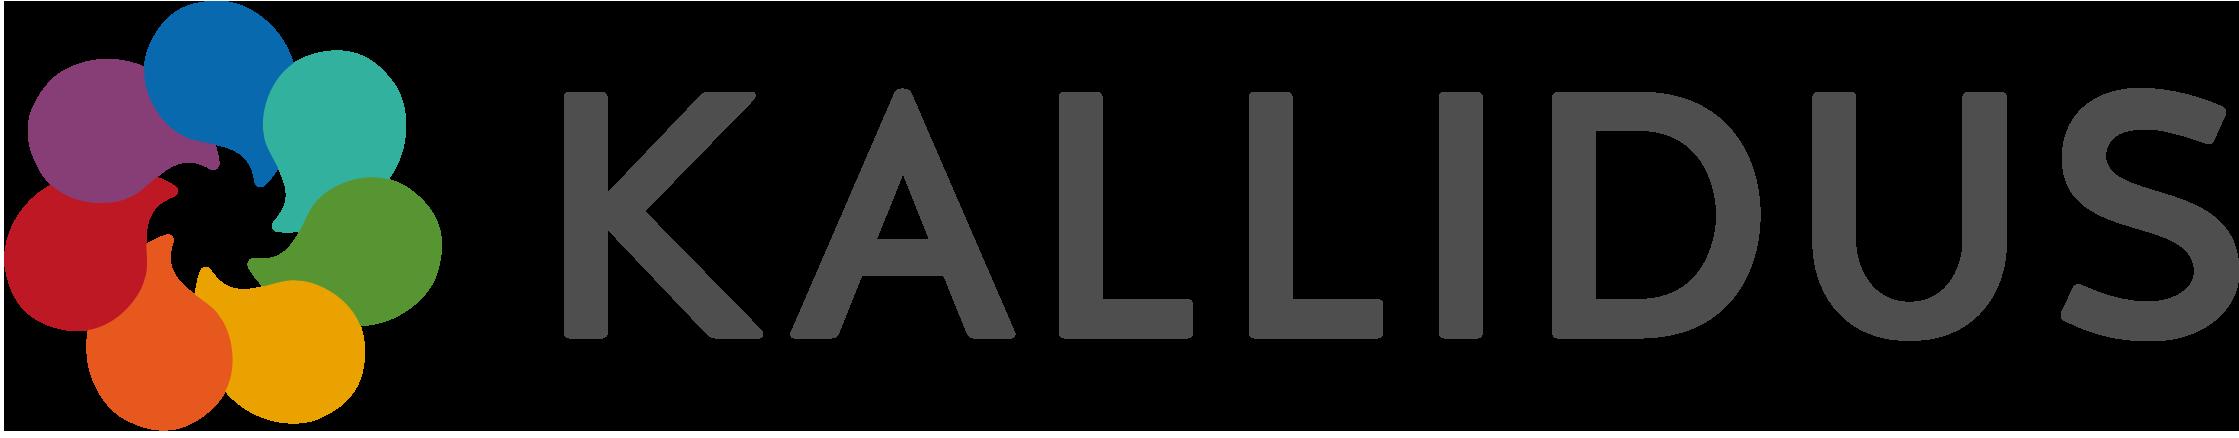 logo-final-RGB-letterbox.png